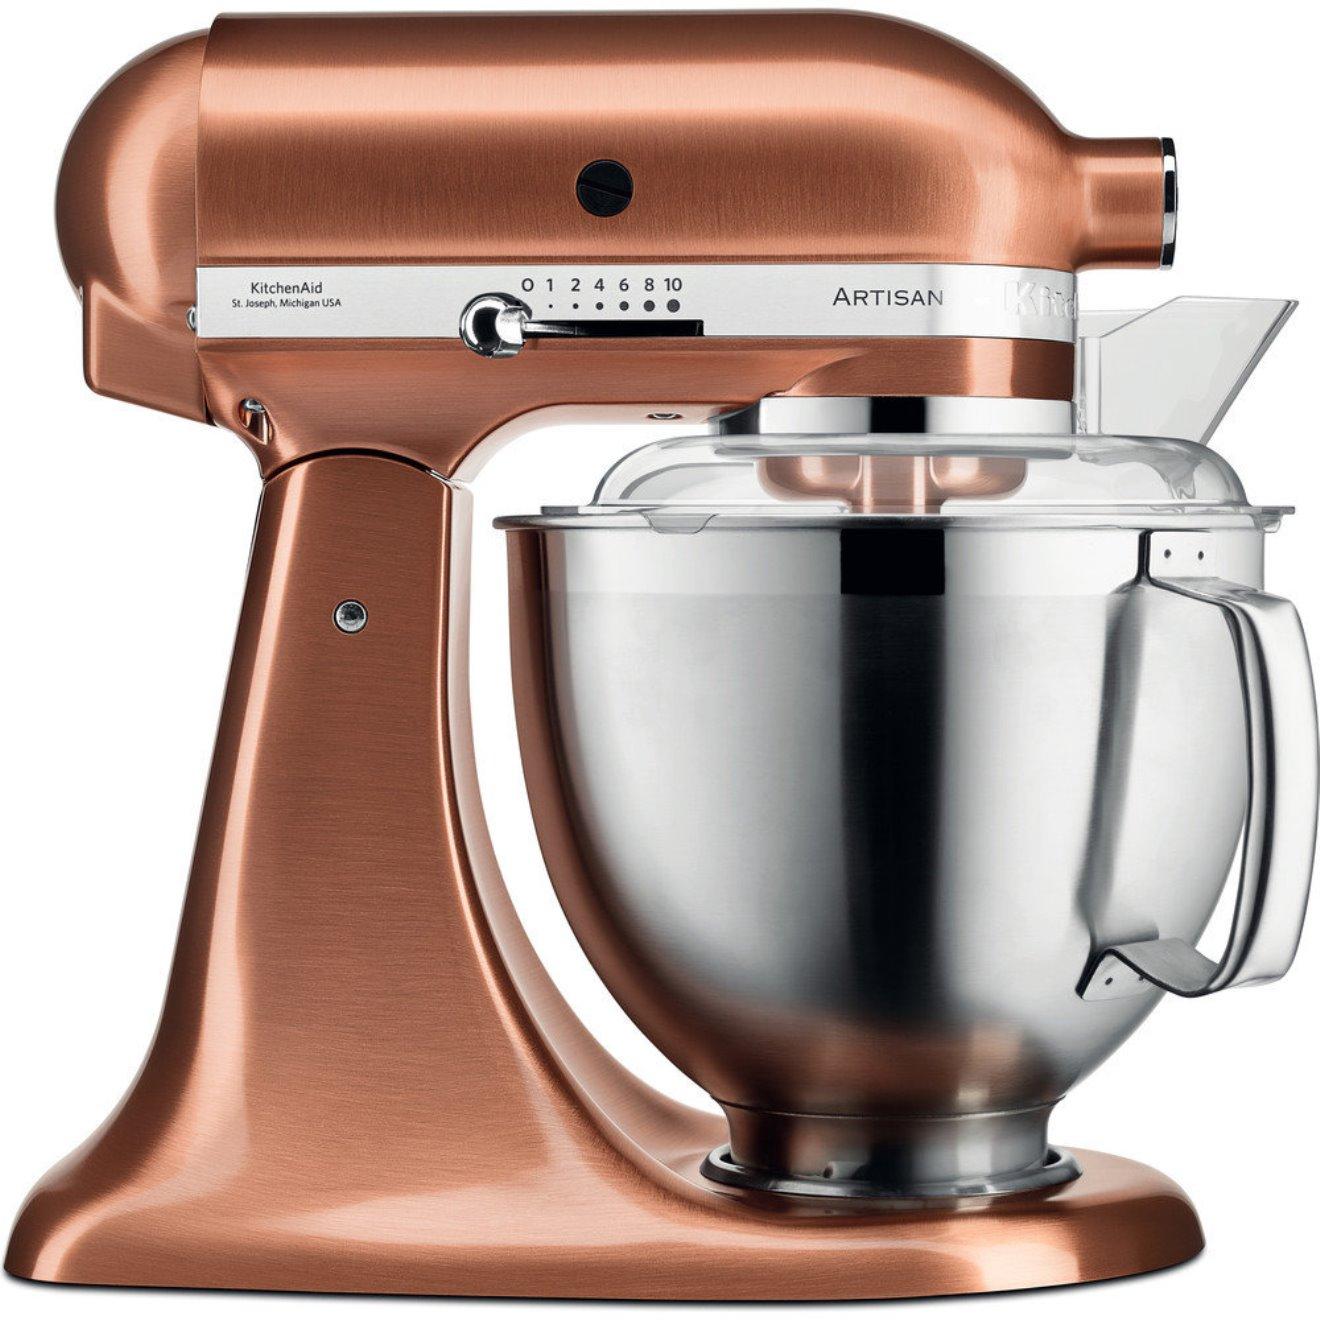 Онлайн каталог PROMENU: Миксер планетарный KitchenAid Artisan, объем чаши 4,83 л, мощность 300 Вт, медный                               5KSM185PSECP